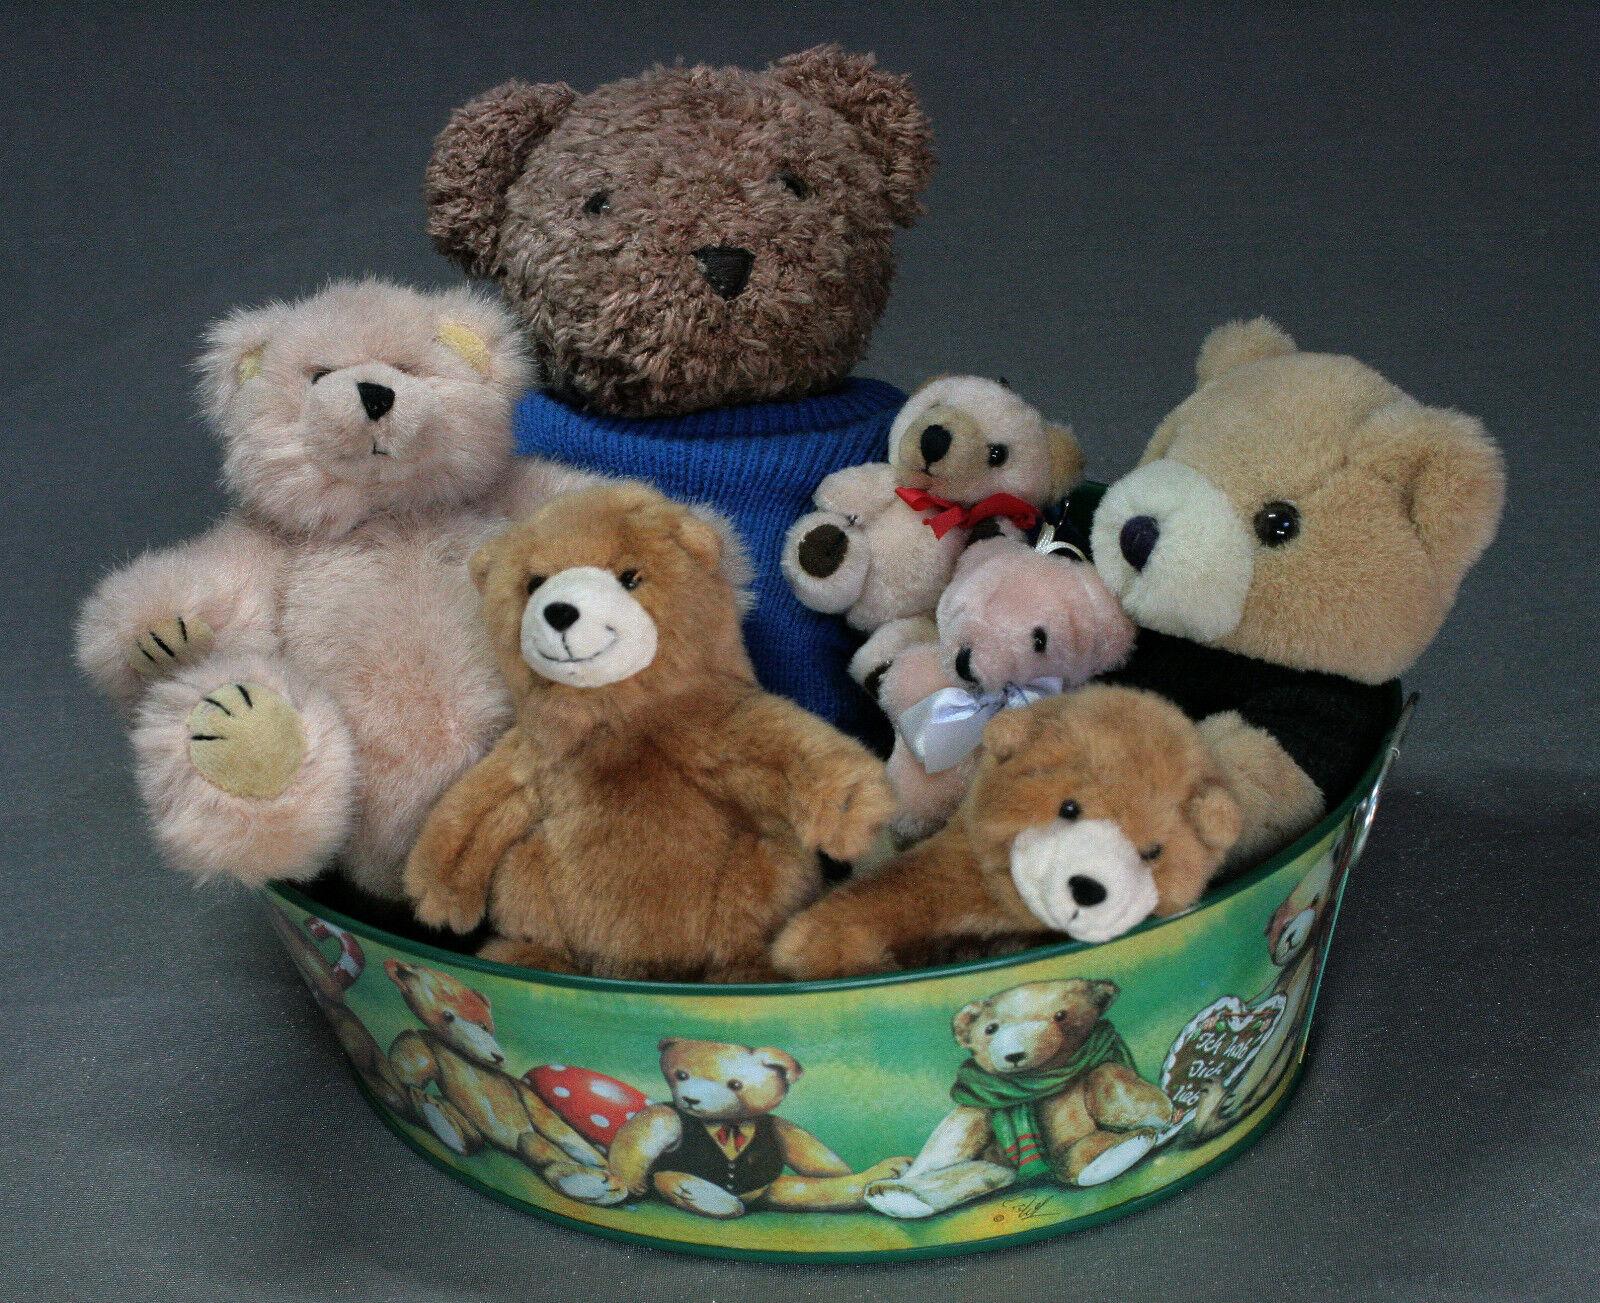 Bärensammlung (Teddys) 17 Stück unbespielt inkl. inkl. inkl. Bärenwanne oval Länge 33cm aeae6d